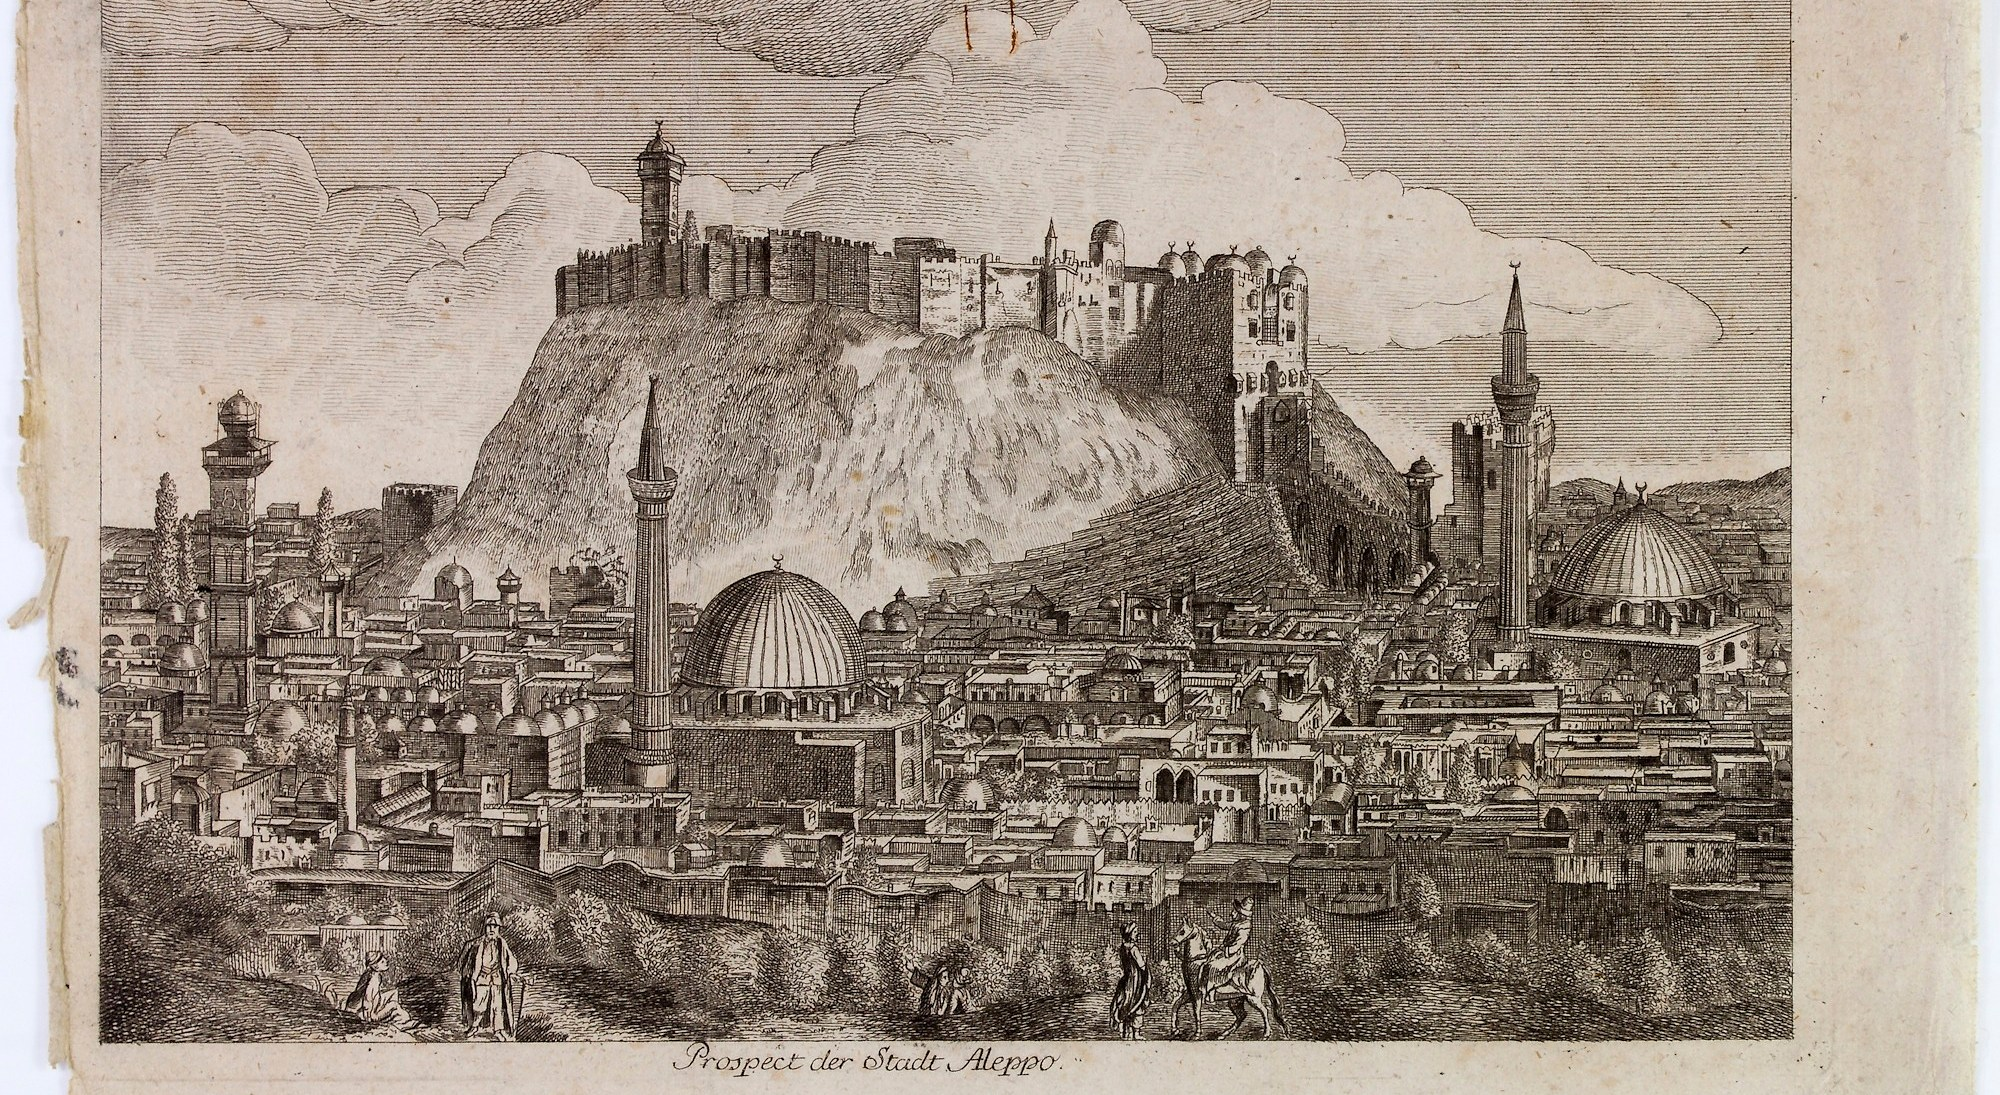 Monochromatic etching of Citadel.